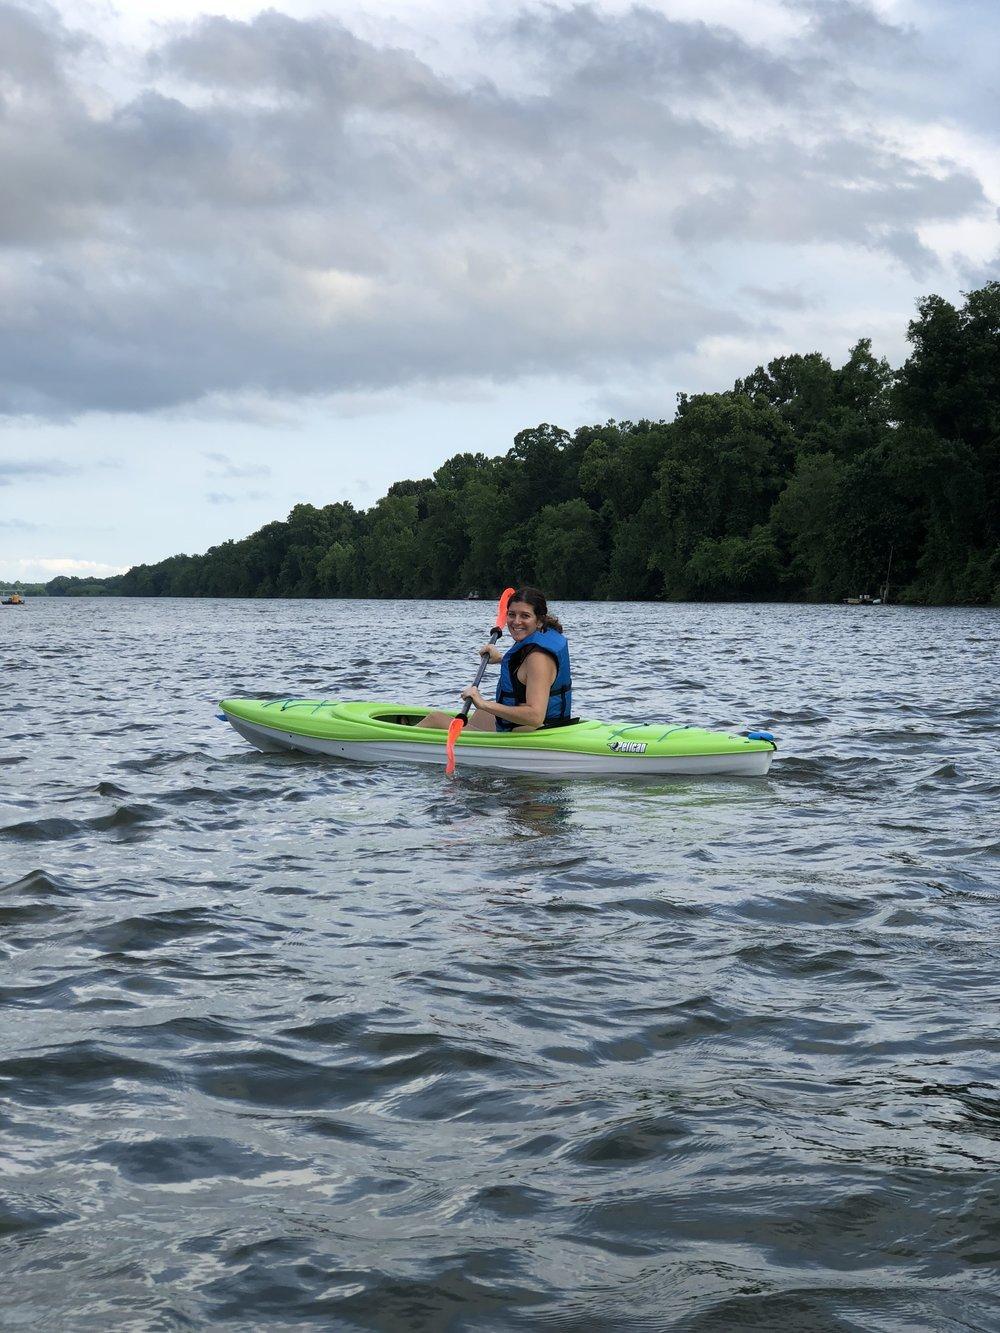 Gentle Movement I've Been Loving Lately #kayaking #joyfulmovement